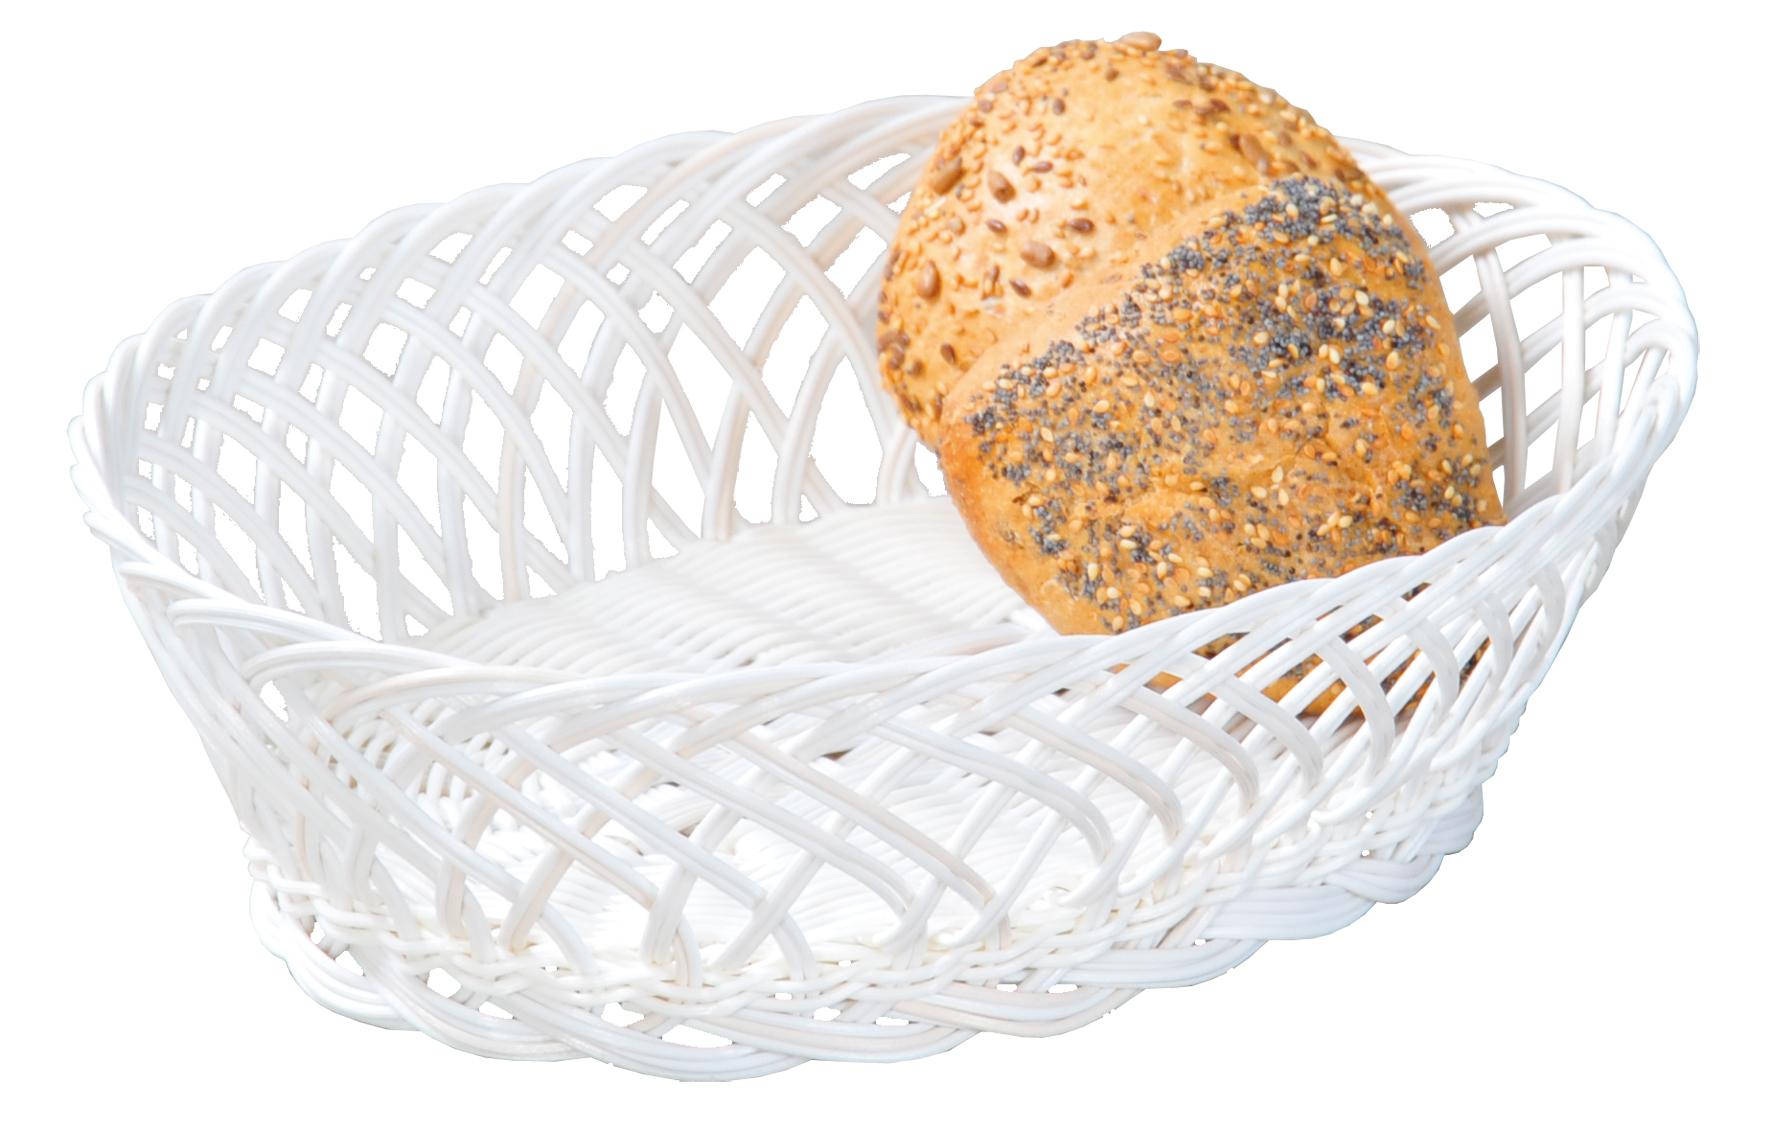 Košík na pečivo, plast, 24 x 20 x 6 cm, Kesper